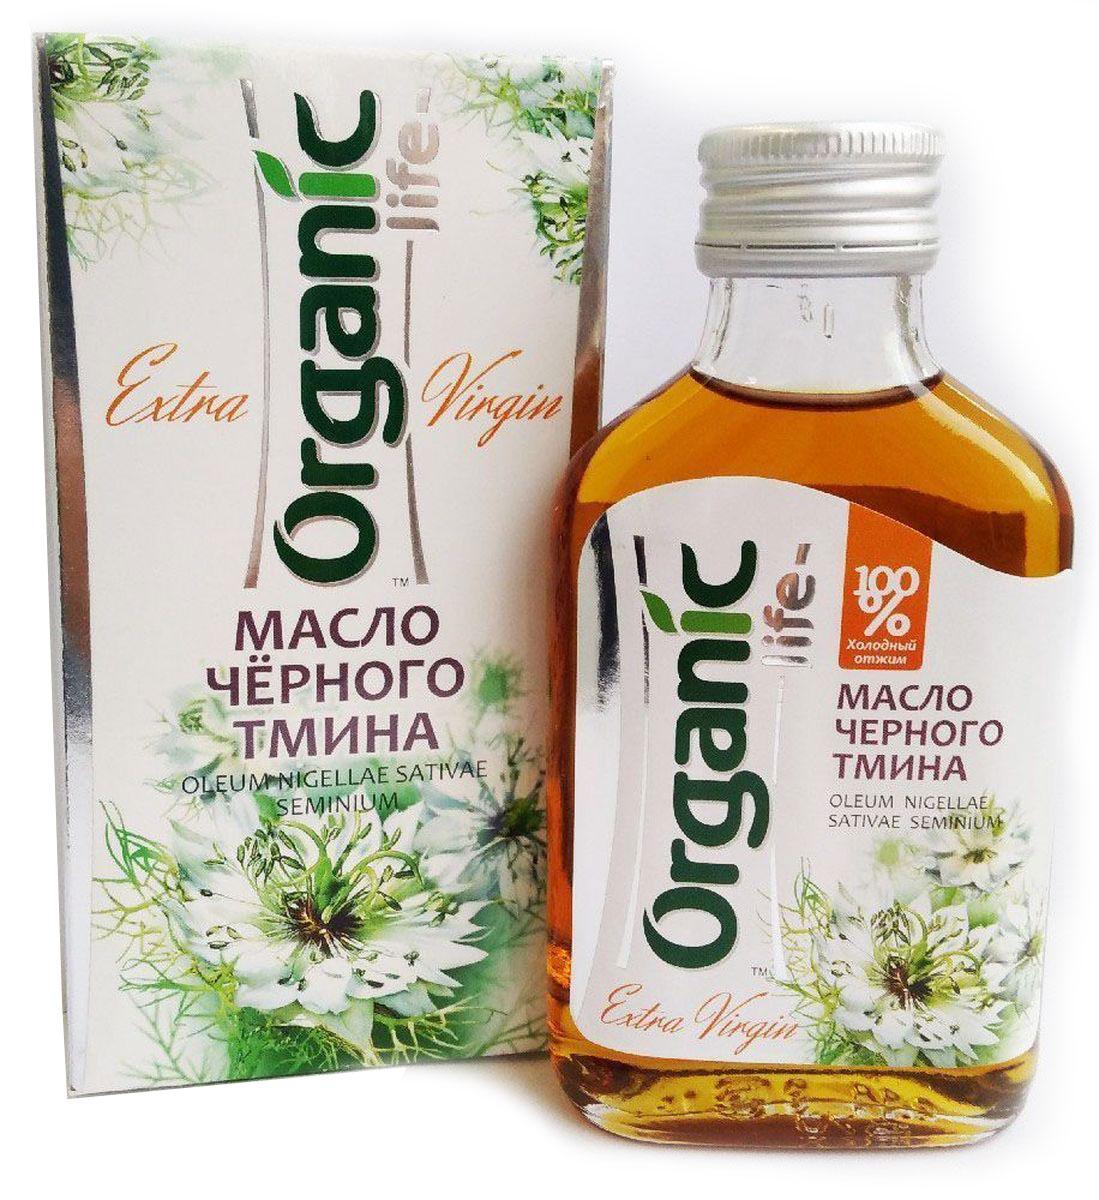 Organic Life масло черного тмина, 100 мл